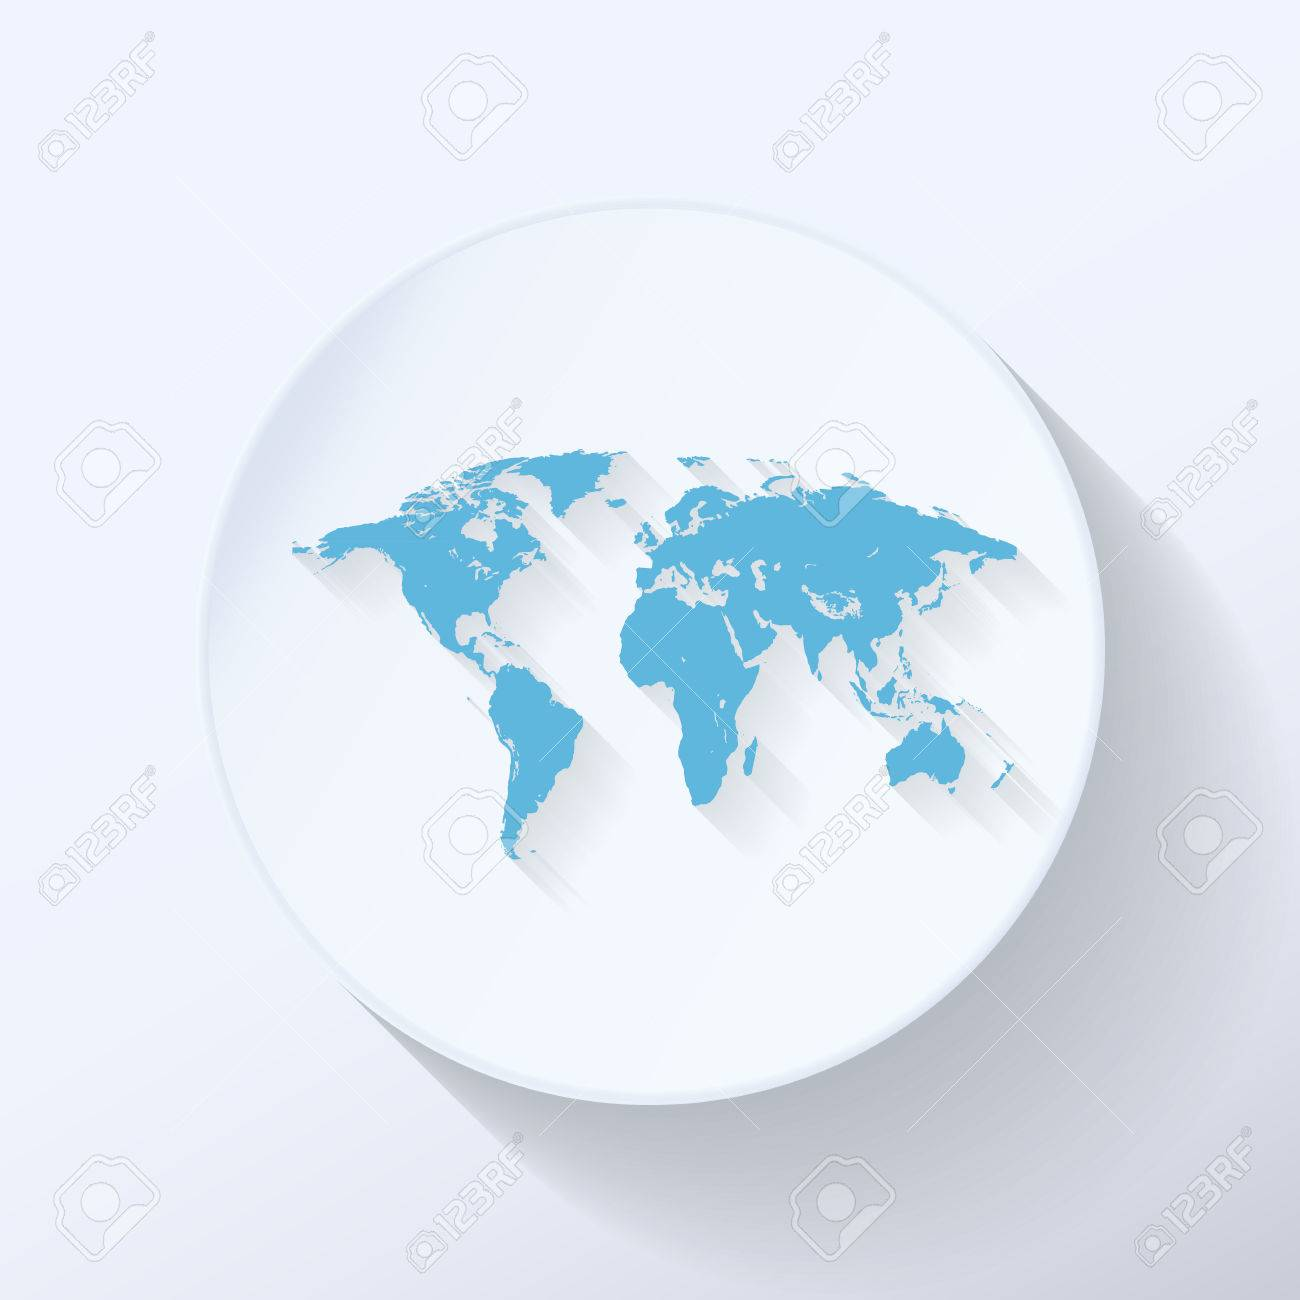 Illustration world map flat icon with light blue color royalty illustration world map flat icon with light blue color stock vector 23922502 gumiabroncs Gallery